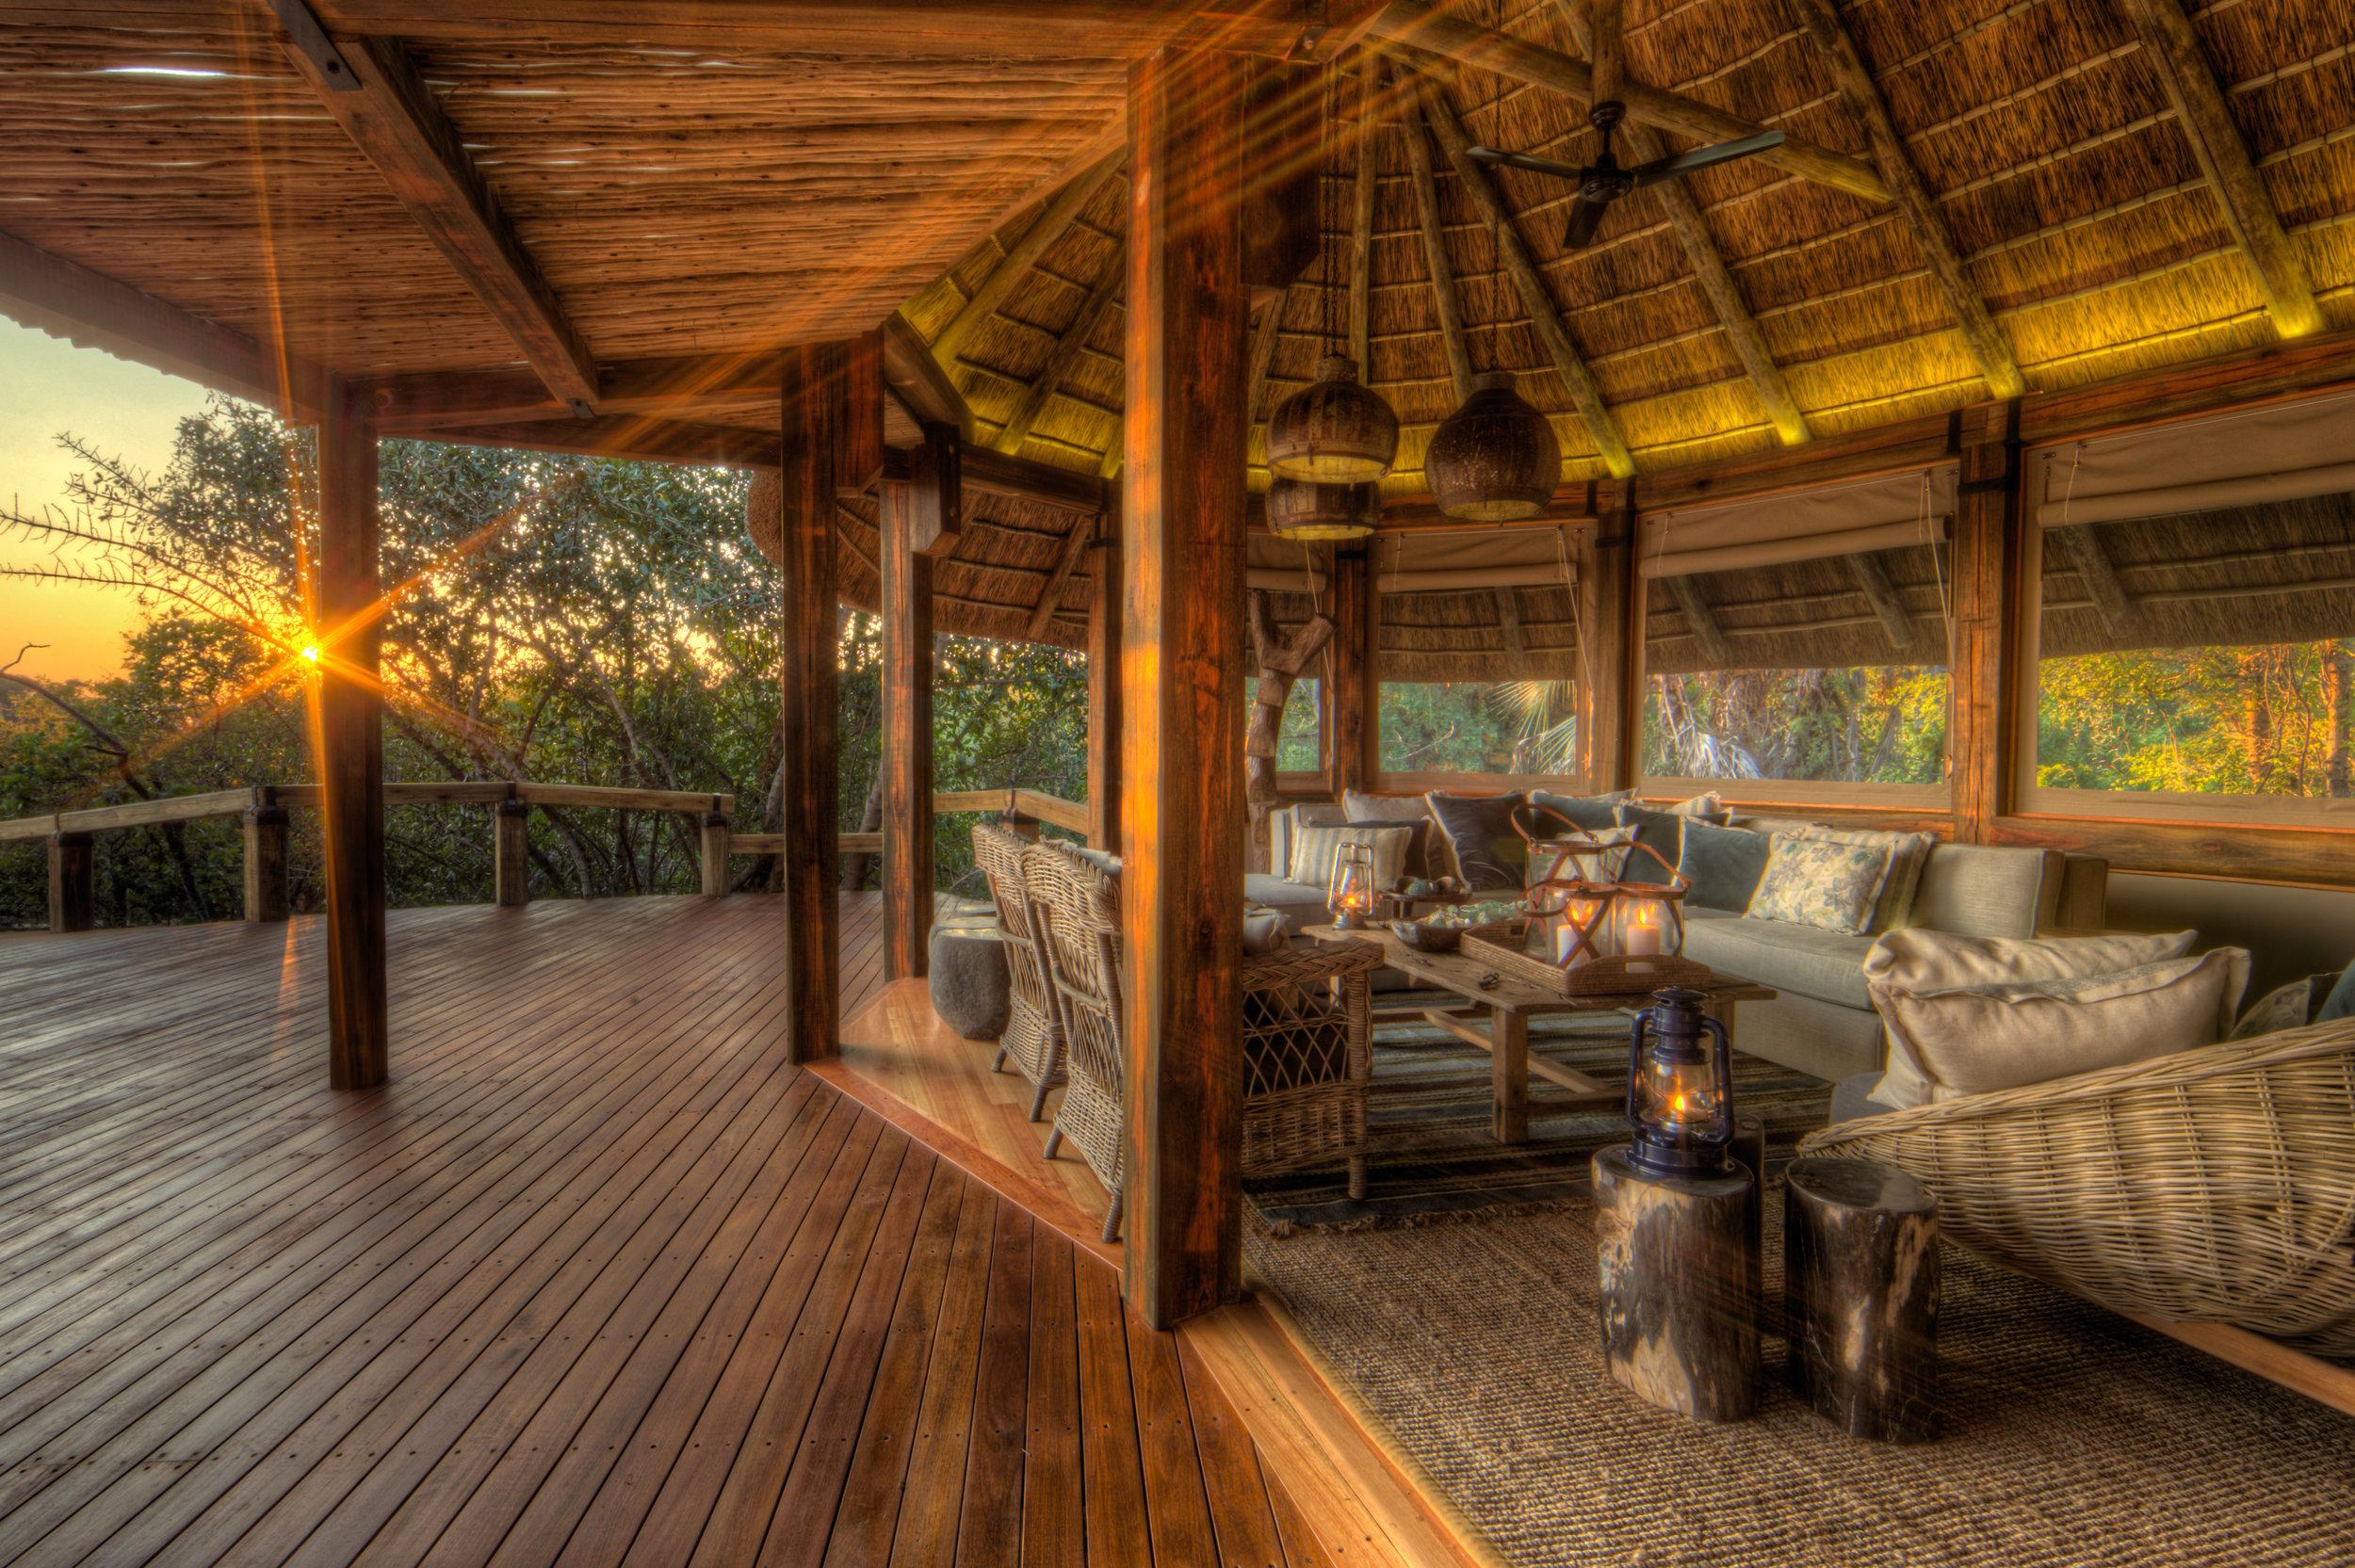 lounge3-camp_o-apr-16-edit11.jpg